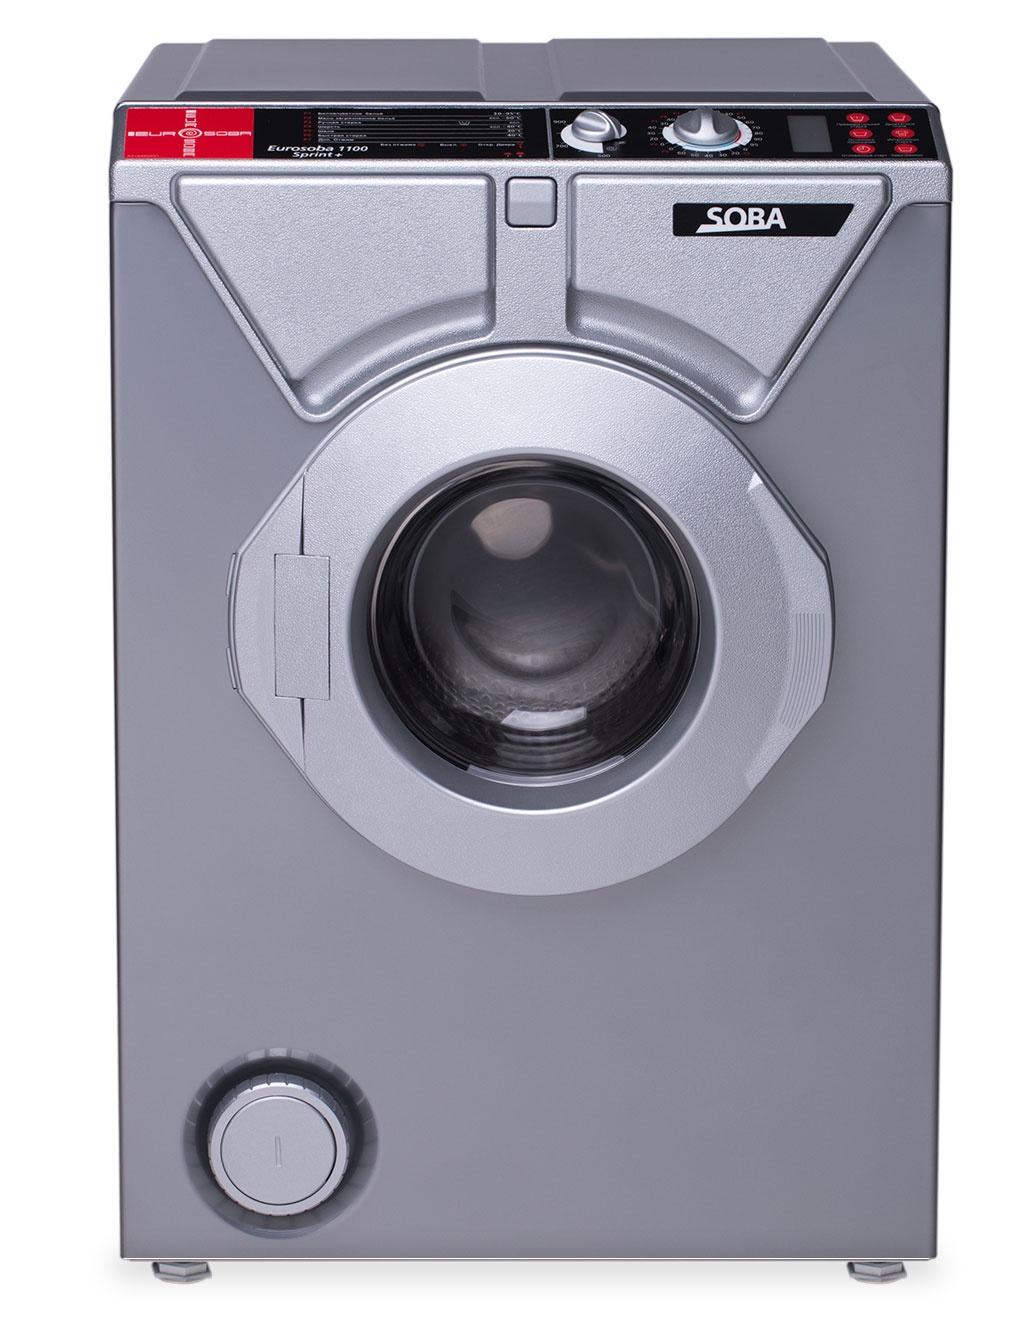 Стиральная машина Eurosoba 1100 Sprint Plus Inox Eurosoba